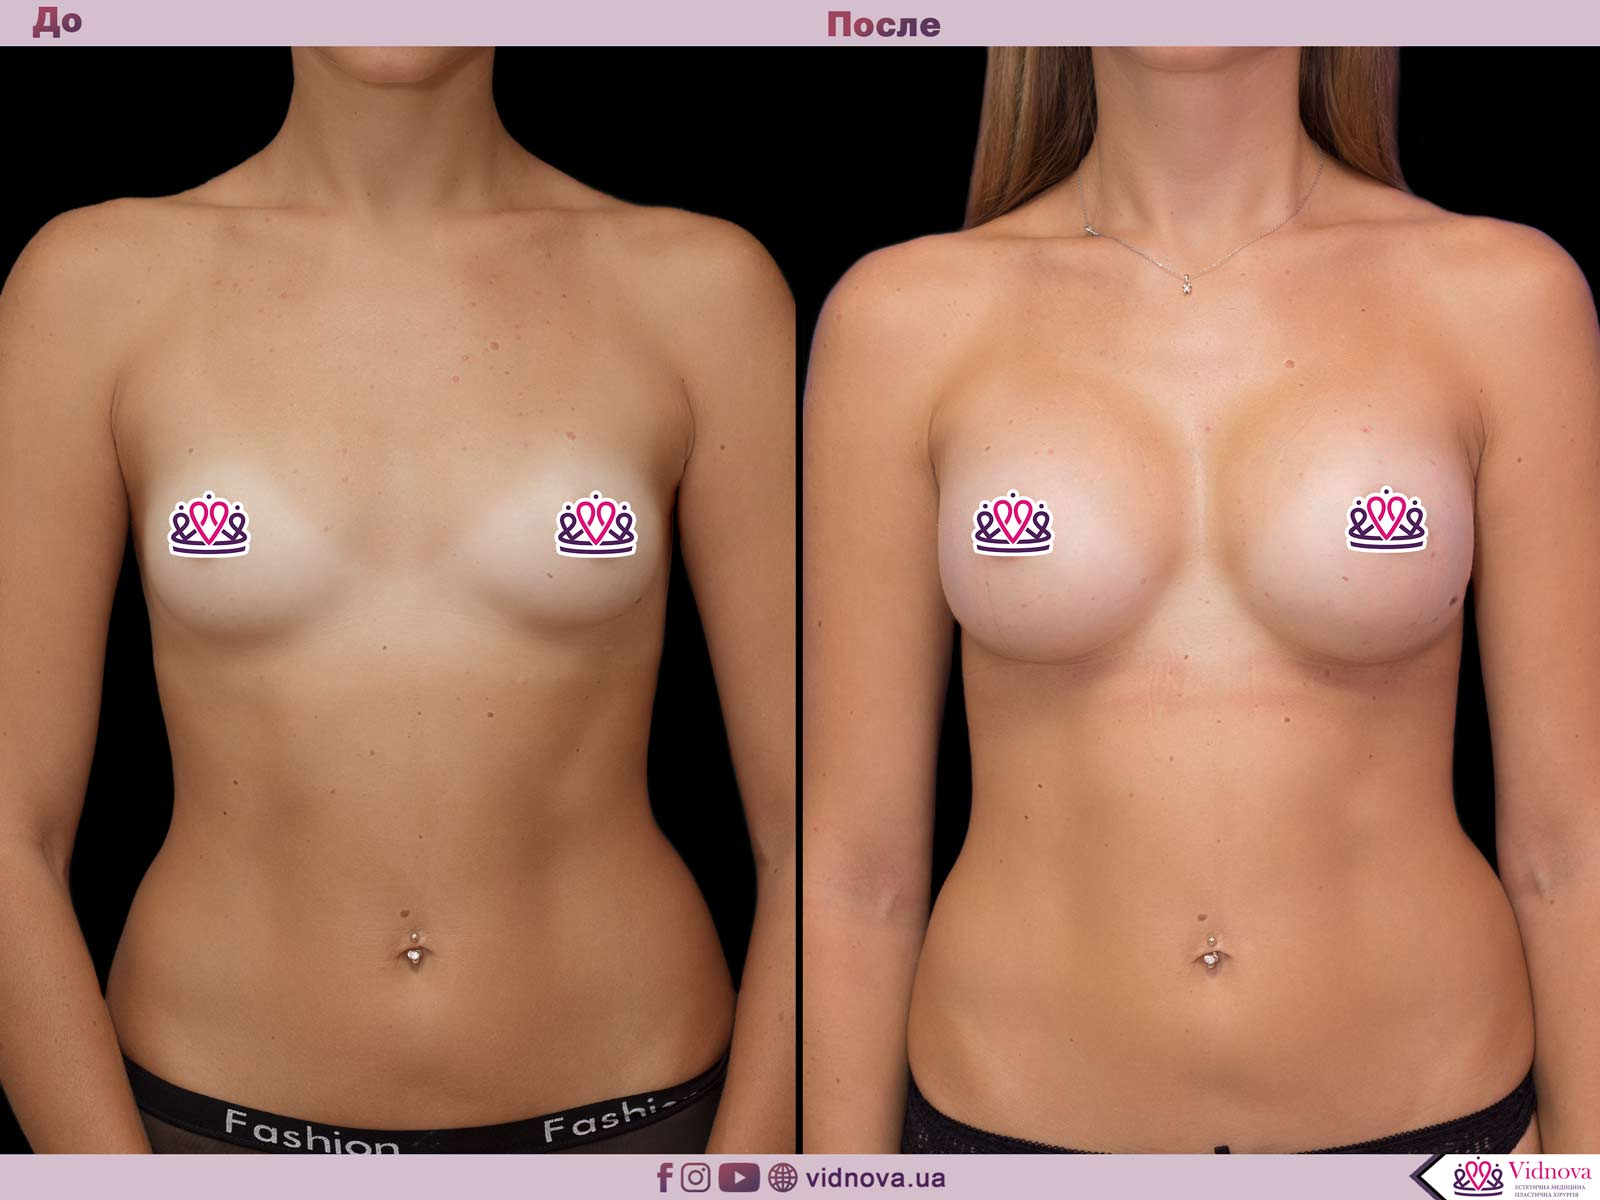 Увеличение груди: Фото ДО и ПОСЛЕ - Пример №50-1 - Клиника Vidnova